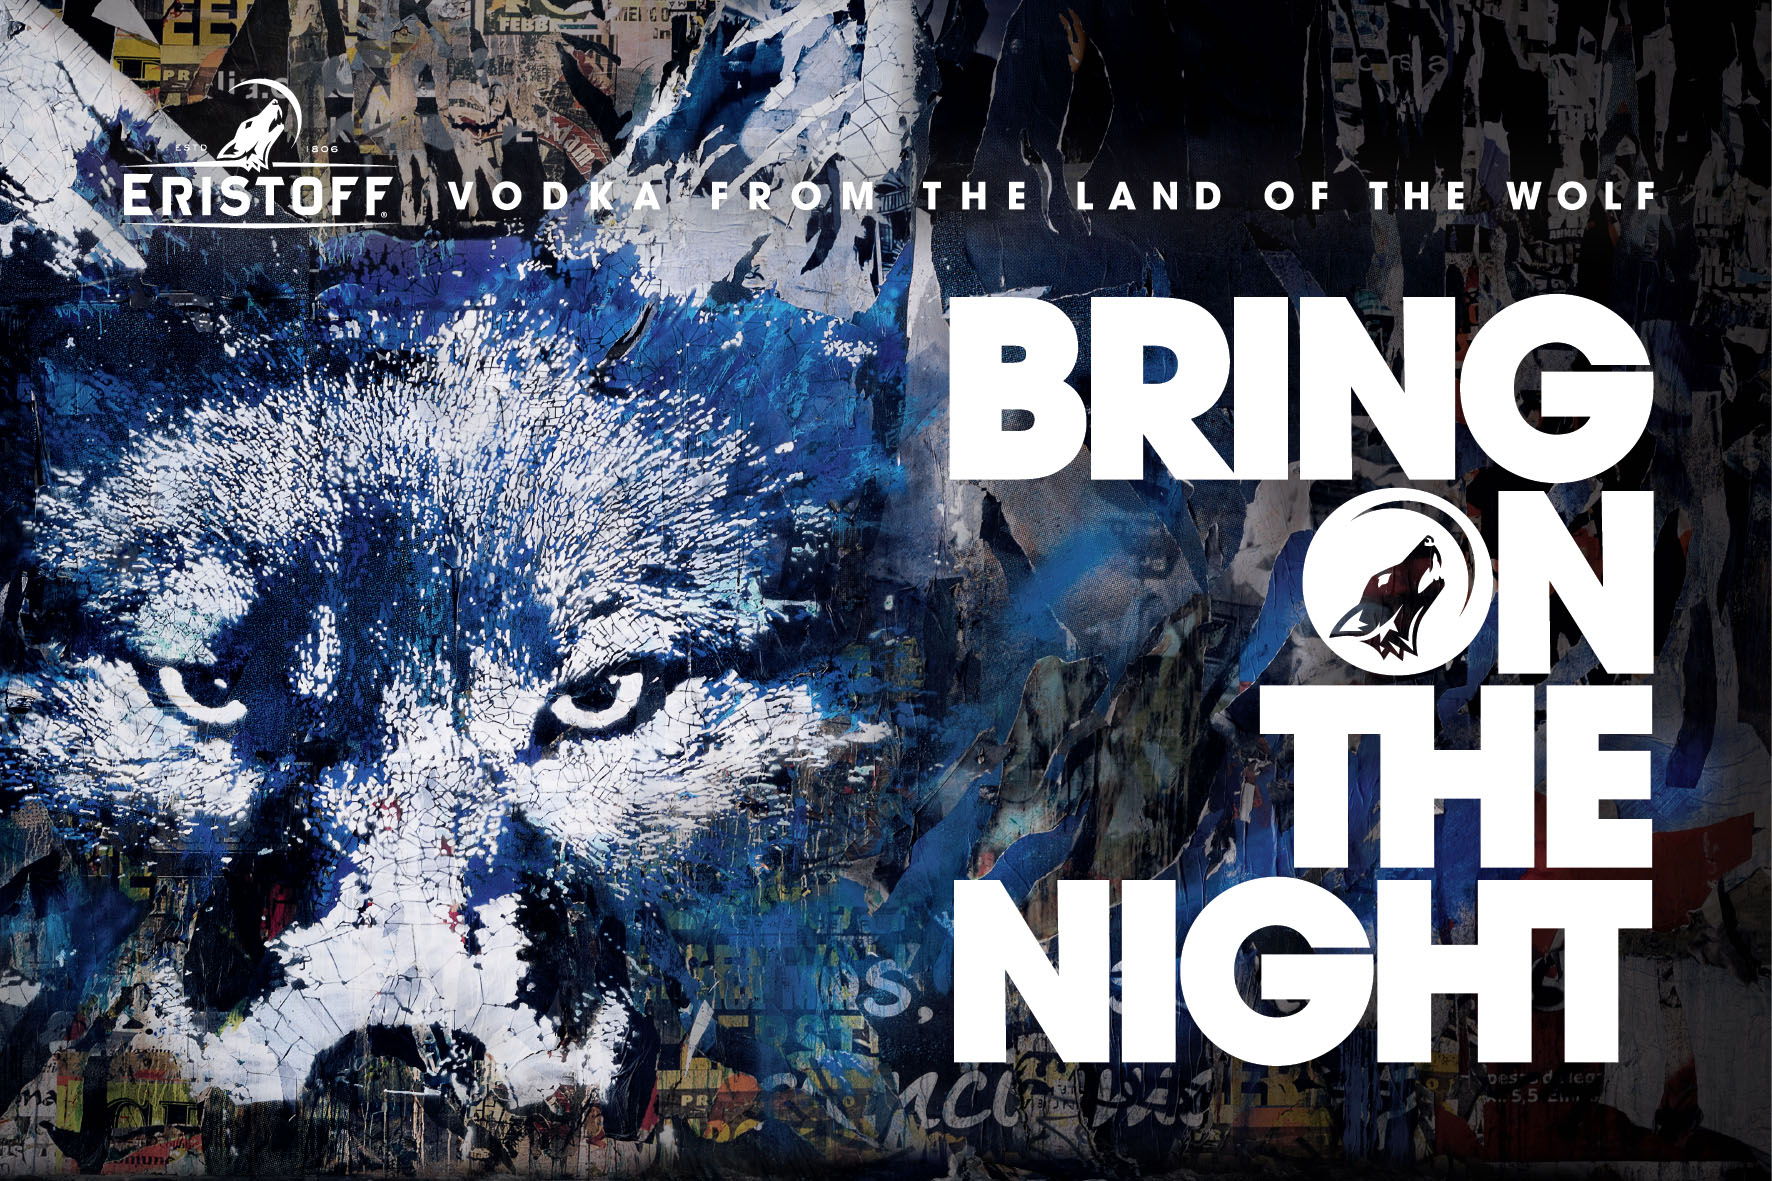 Eristoff - Bring on the Night